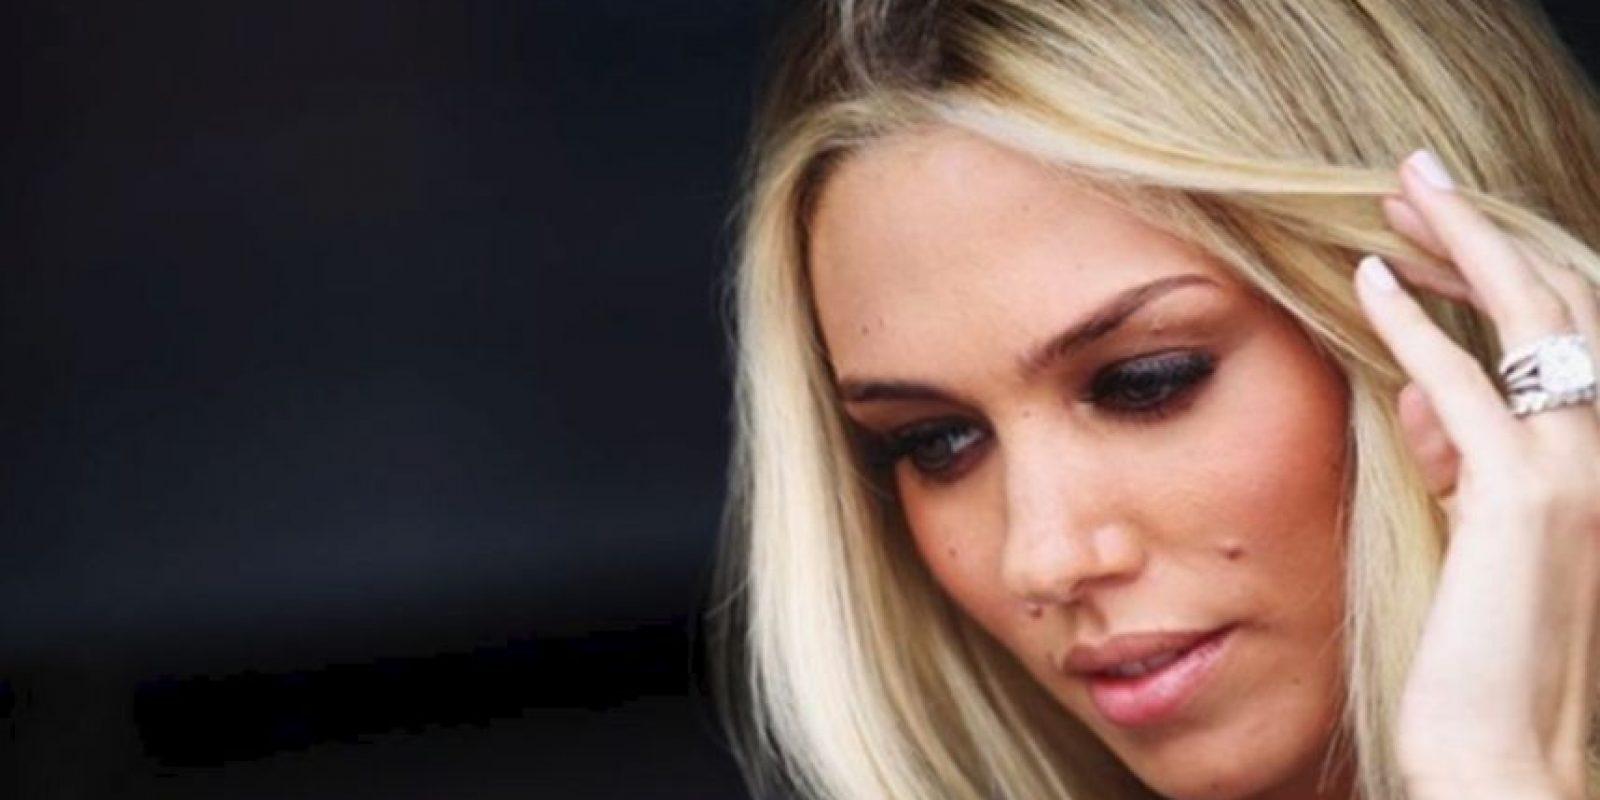 Petra Ecclestone: La hija menor del patrón de la F1, Bernie Ecclestone Foto:Wikipedia